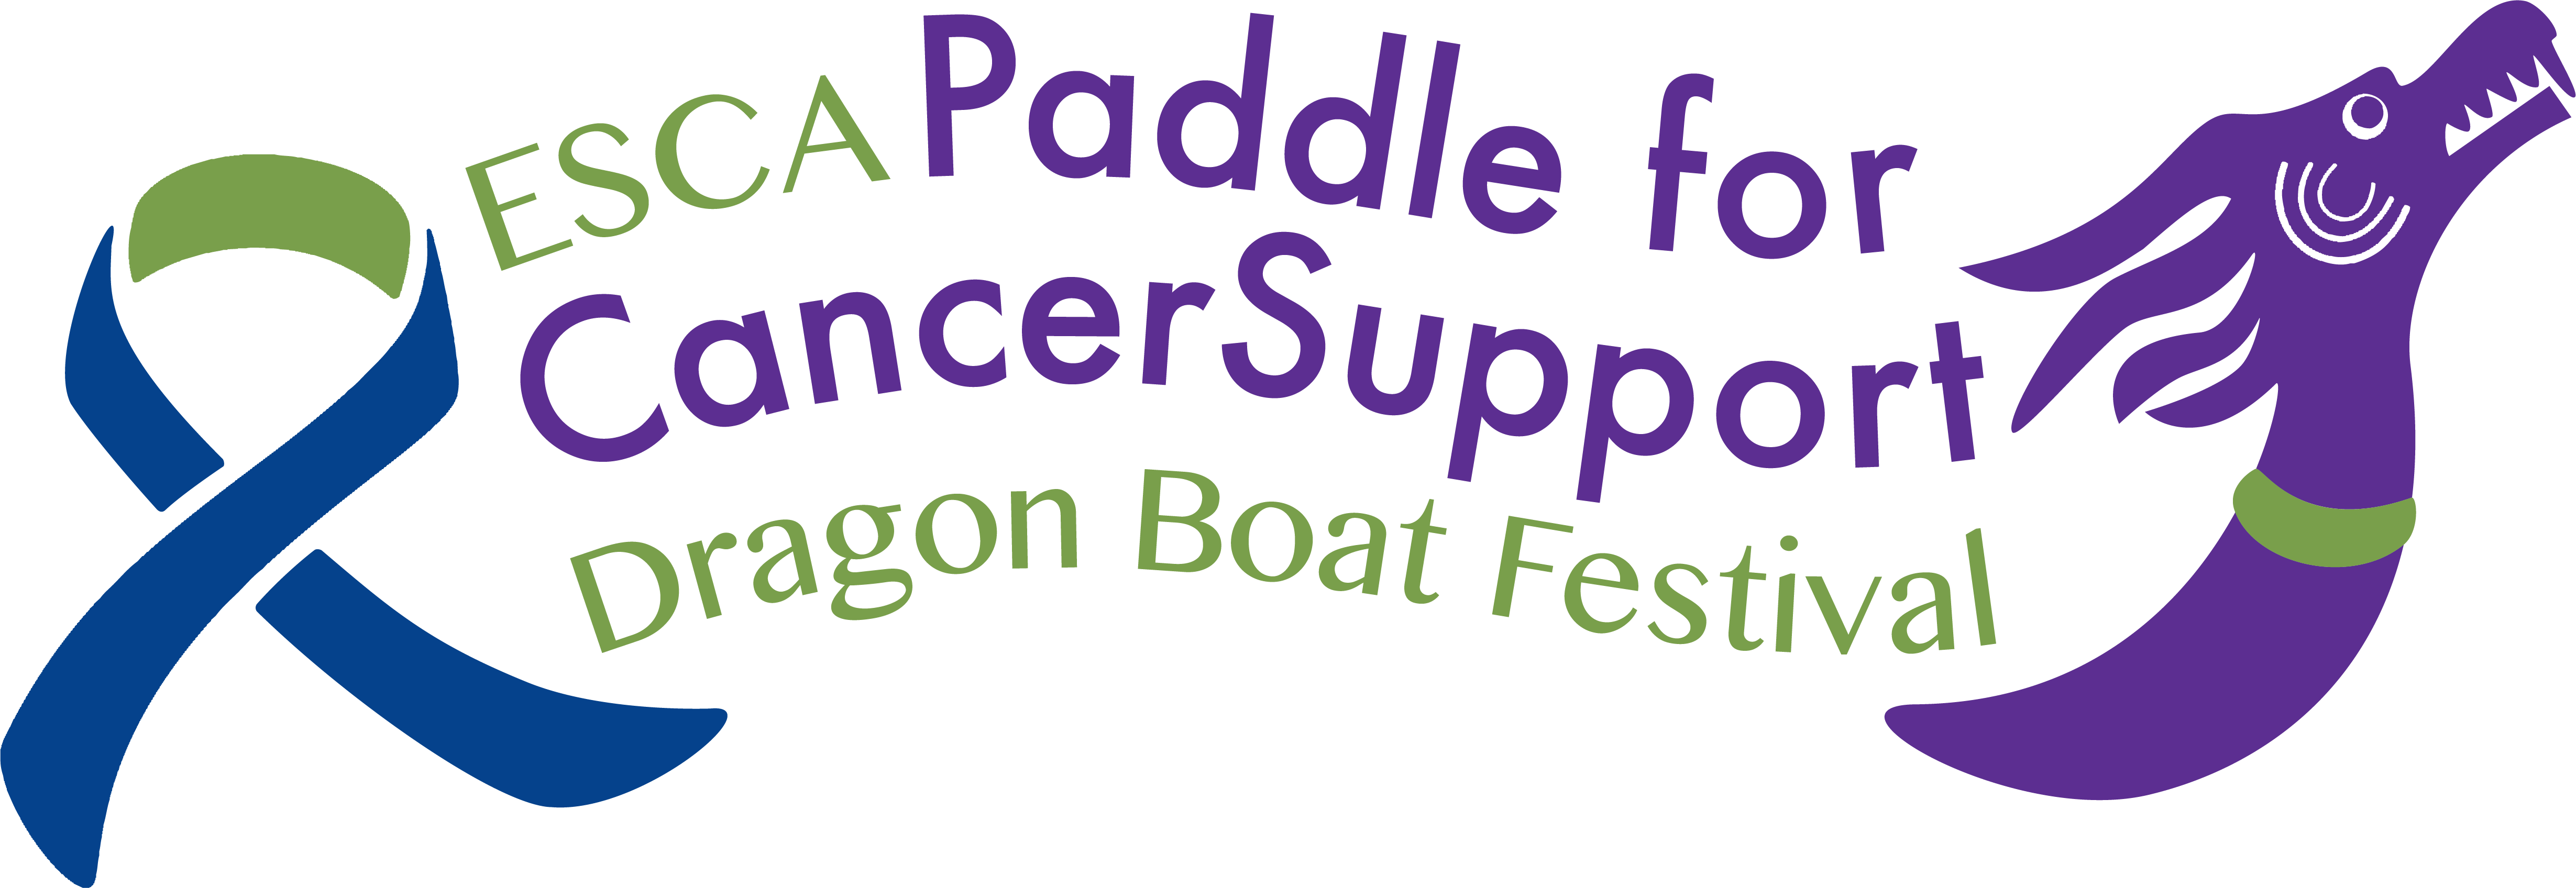 Paddle for Cancer - Dragonboat festival - Lac de Joux, Sunday 4 September 2022